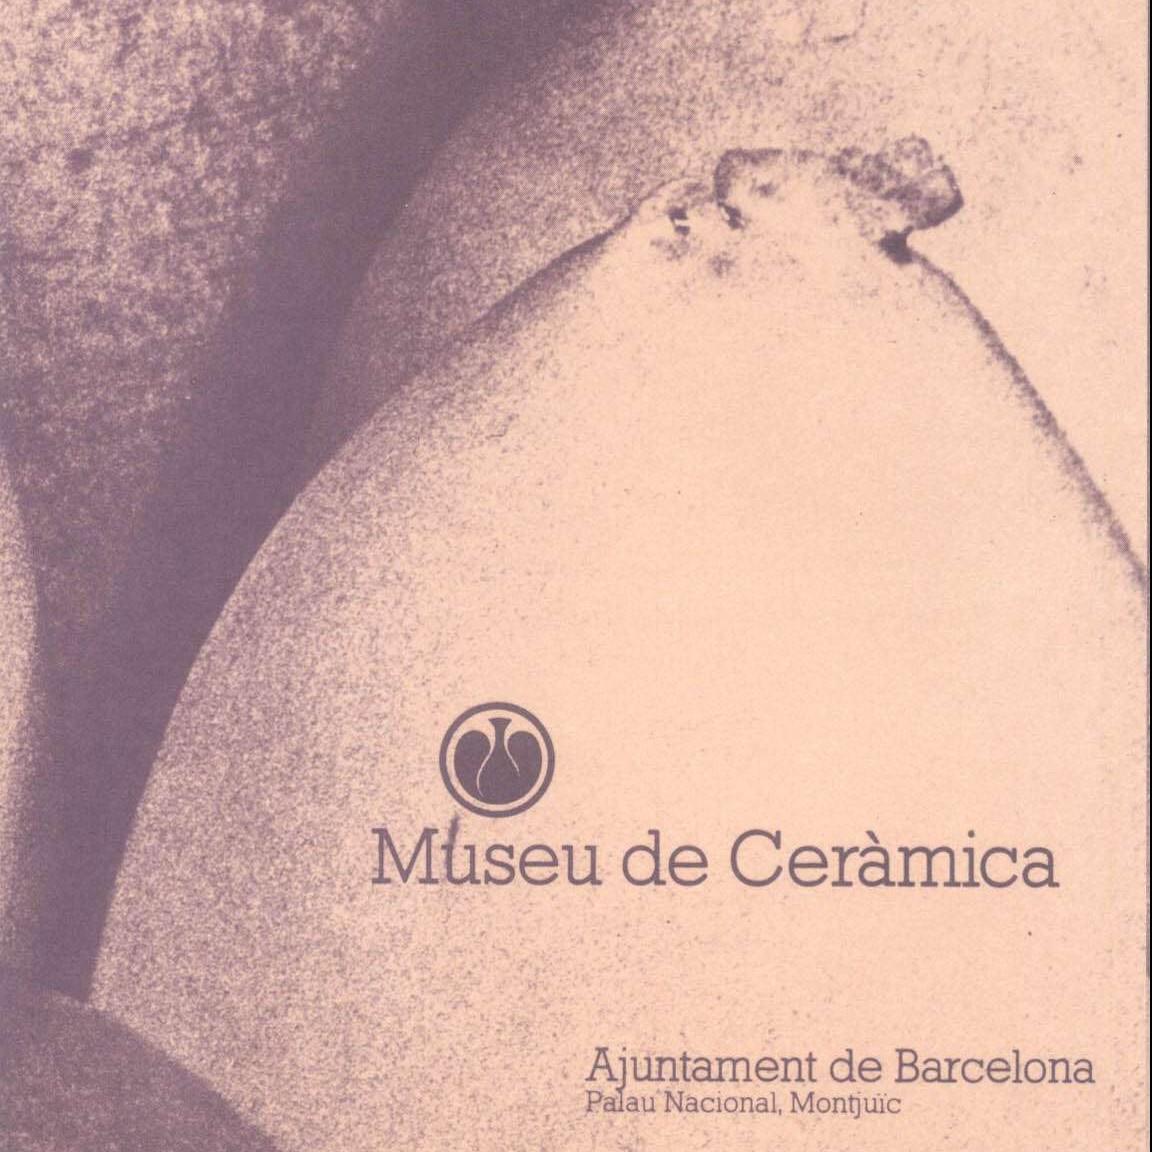 Museu de Ceramica, Barcelona – diciembre 1980 a enero 1981